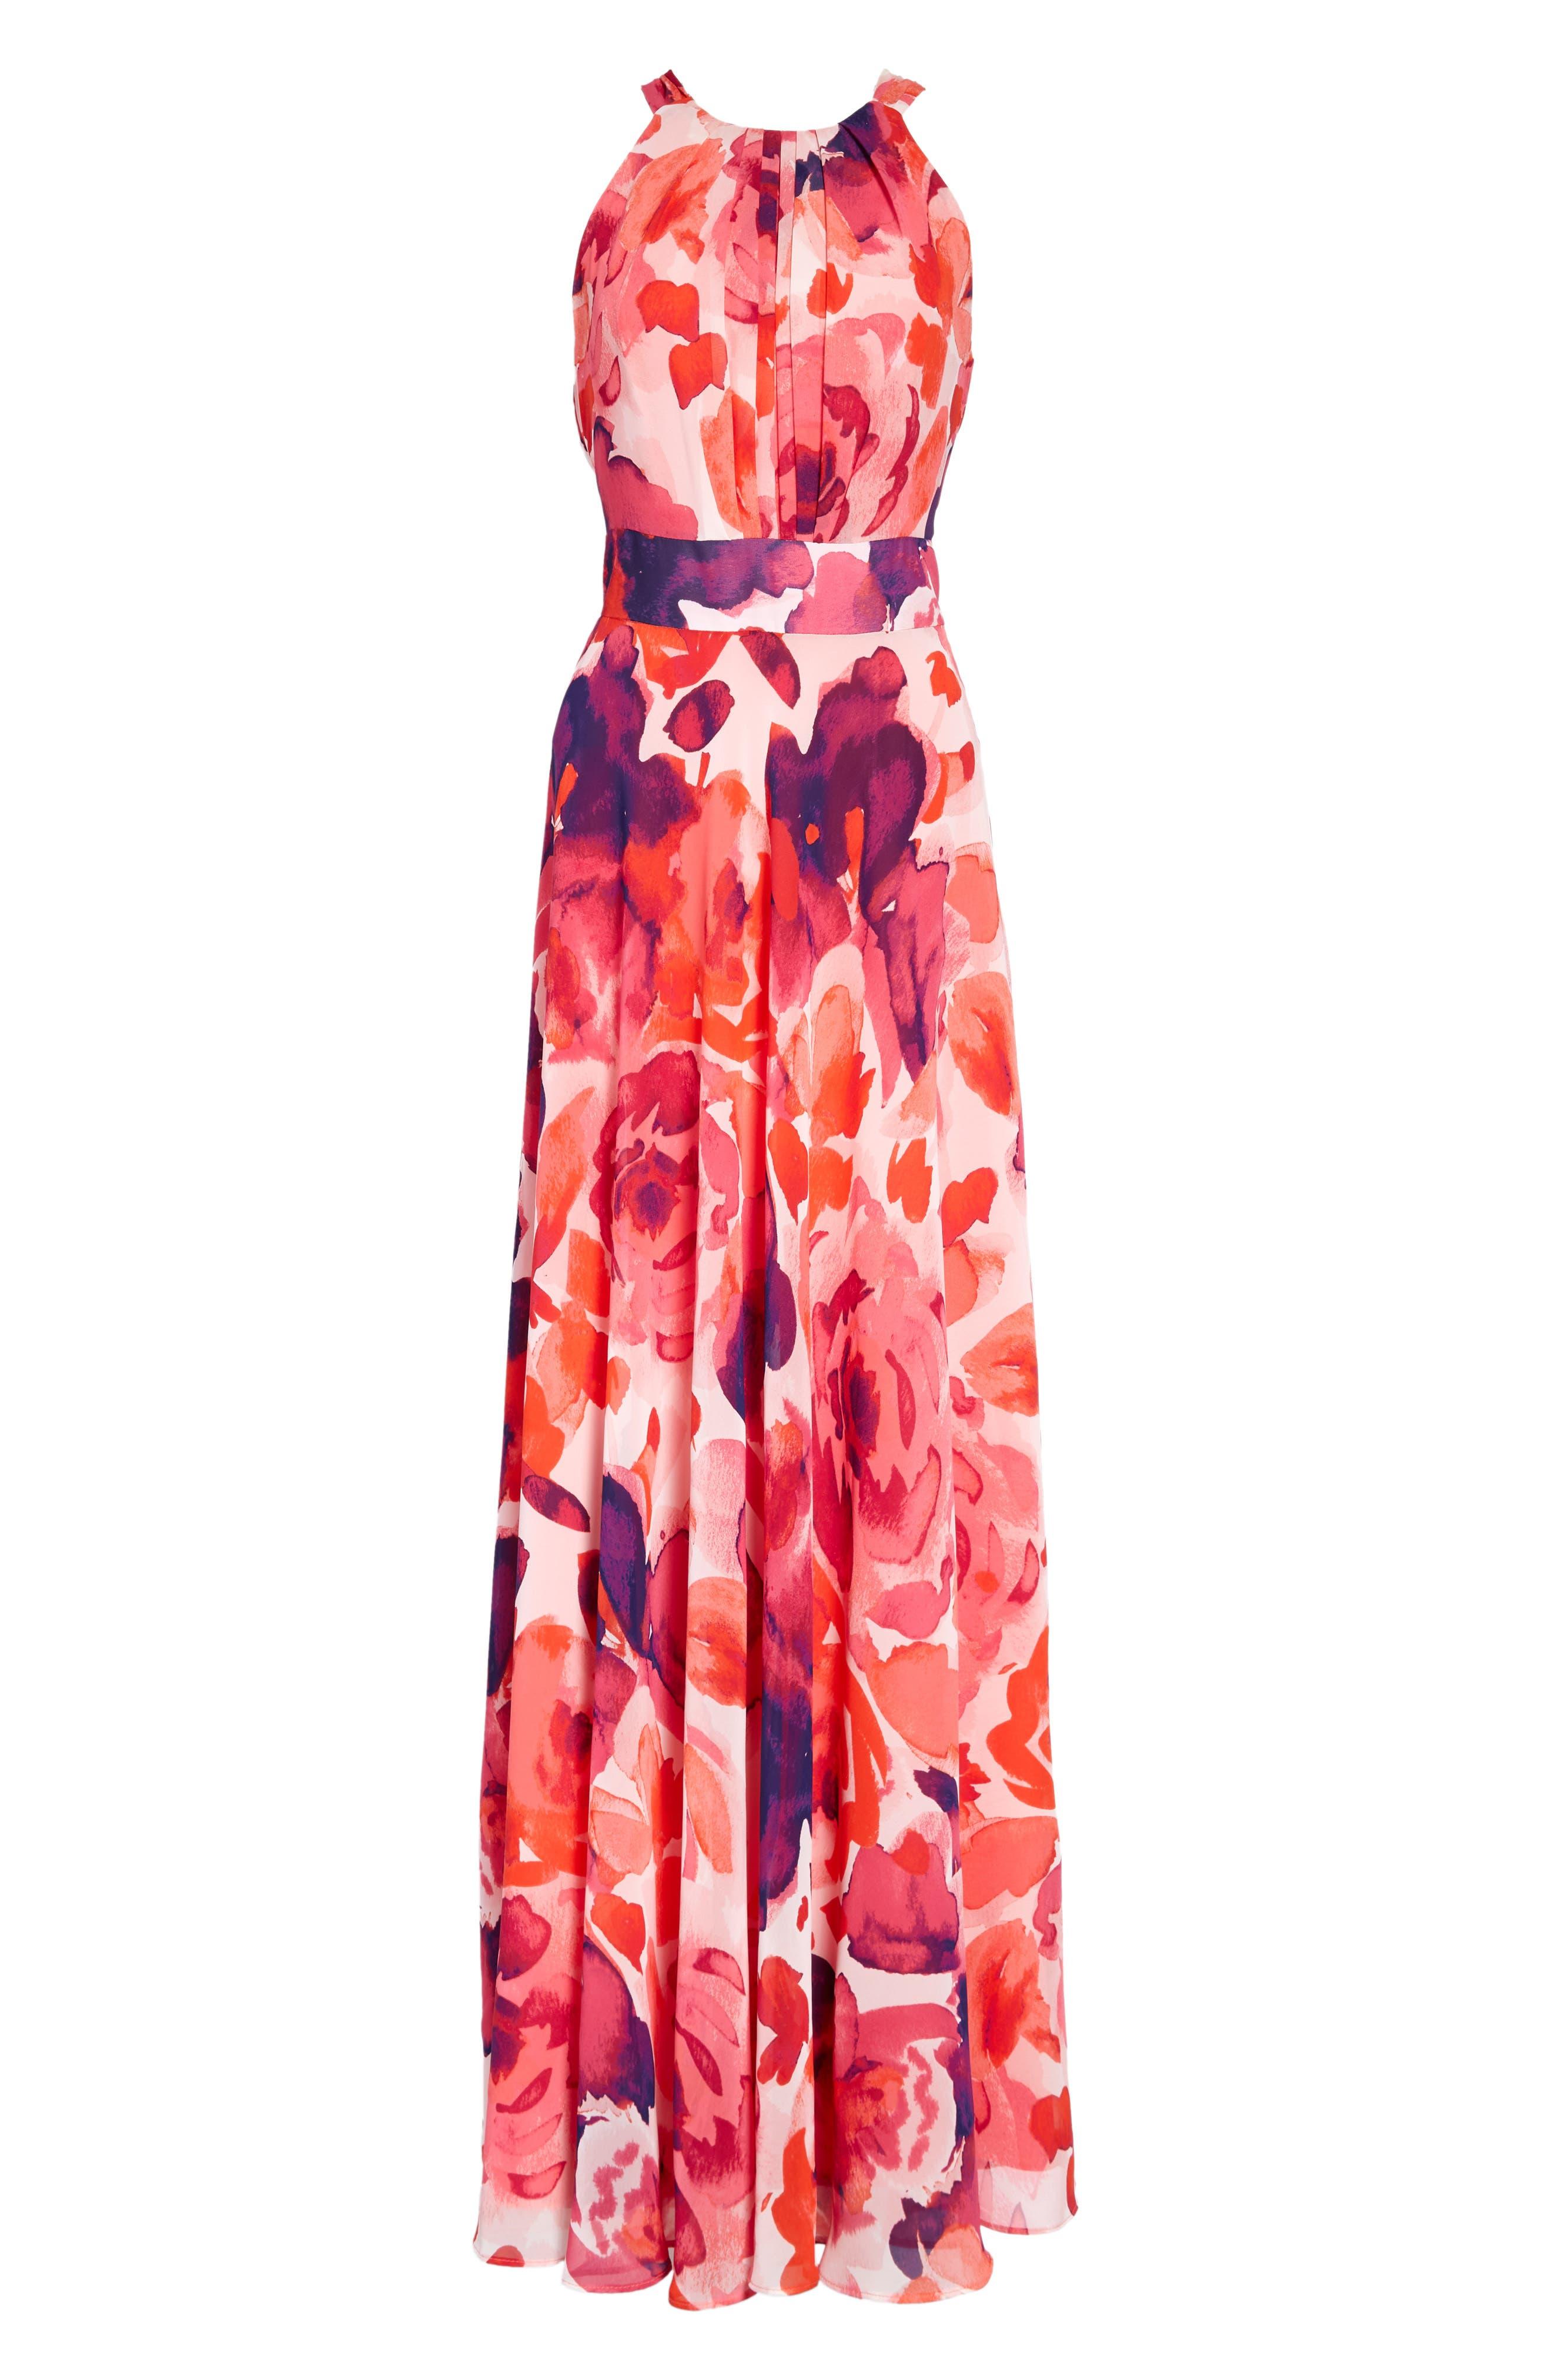 Floral Print Halter Maxi Dress, Main, color, PINK/ CORAL/ PURPLE